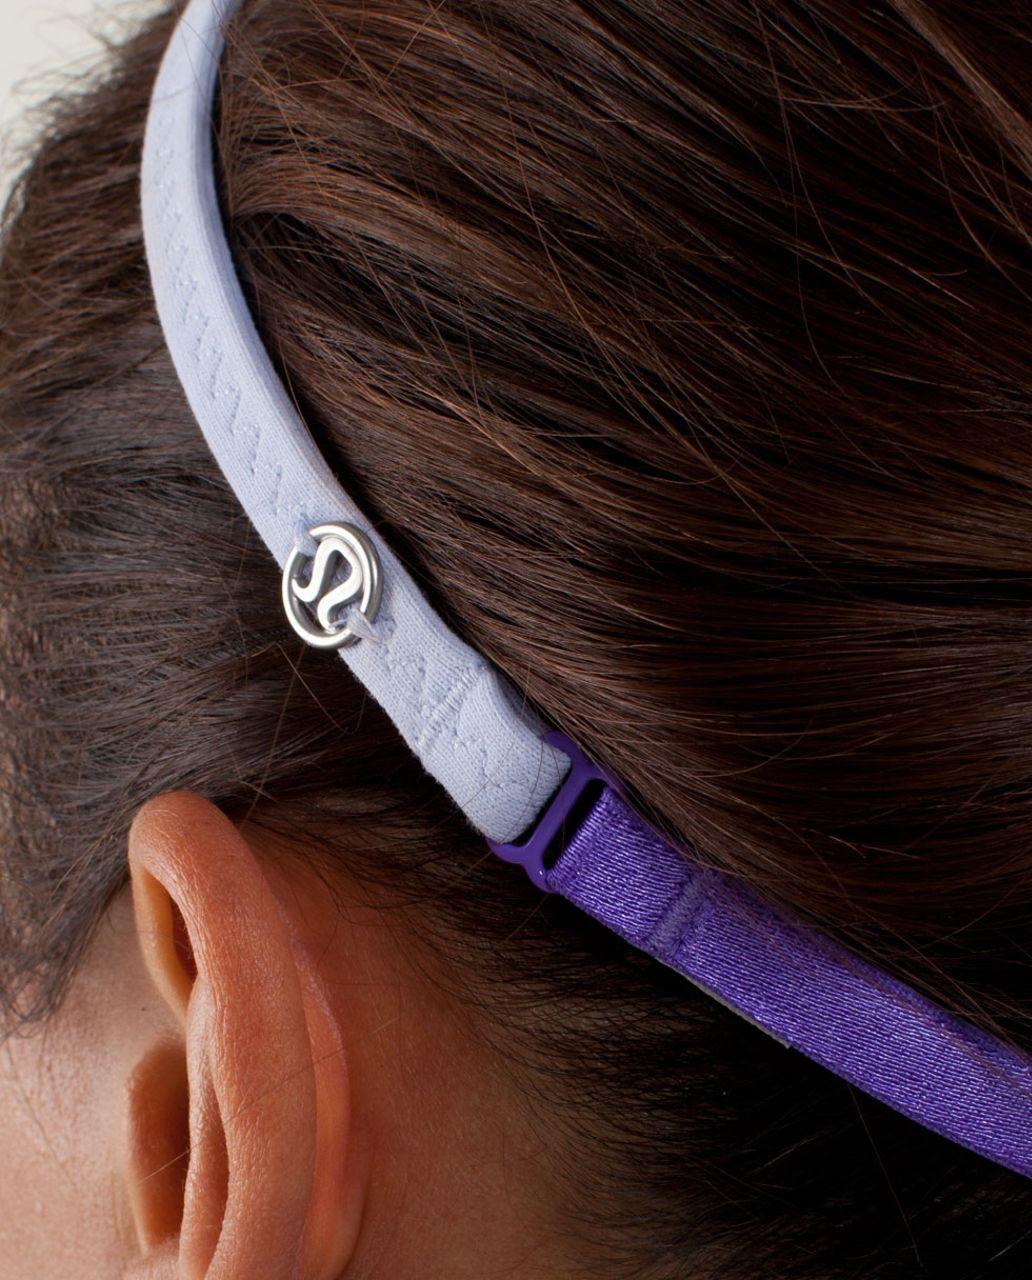 Lululemon Strappy Headband - Cool Breeze